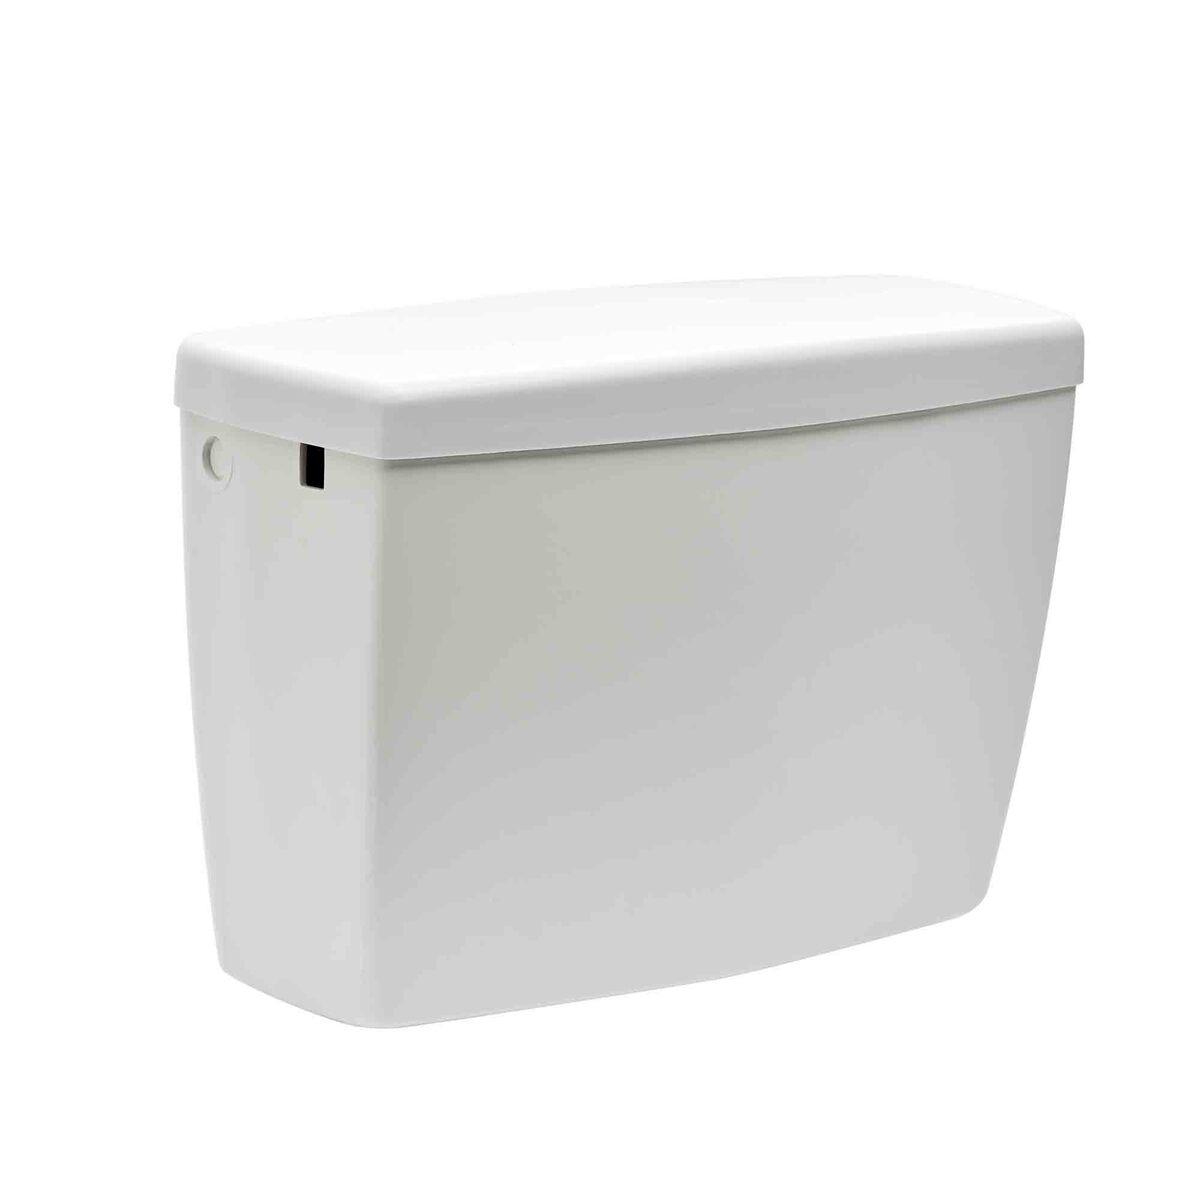 Nádržka Siko na stenu k WC vysoko položená s tiahlom T2454 - nádržka splach.T 2454 horní úsp.